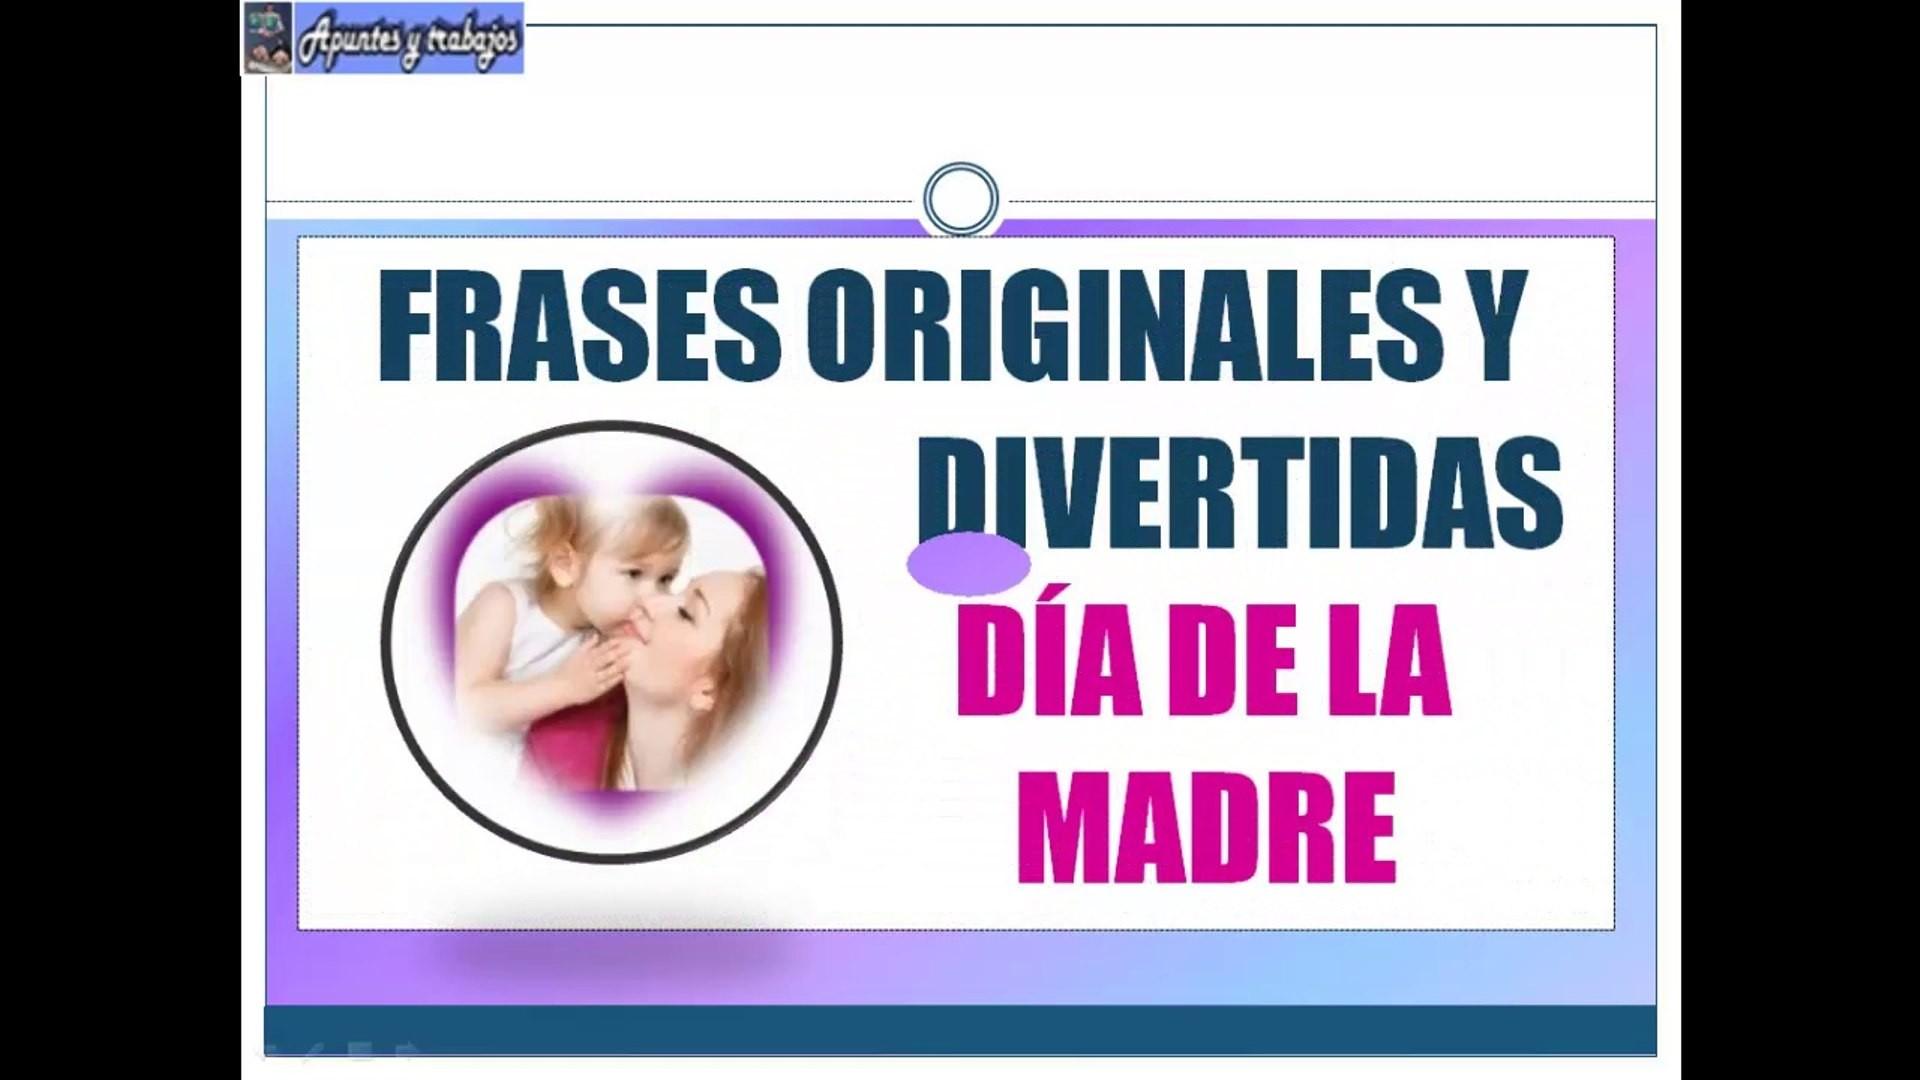 "♥dia de la madre♥ frases divertidas"" vdeo dailymotion"